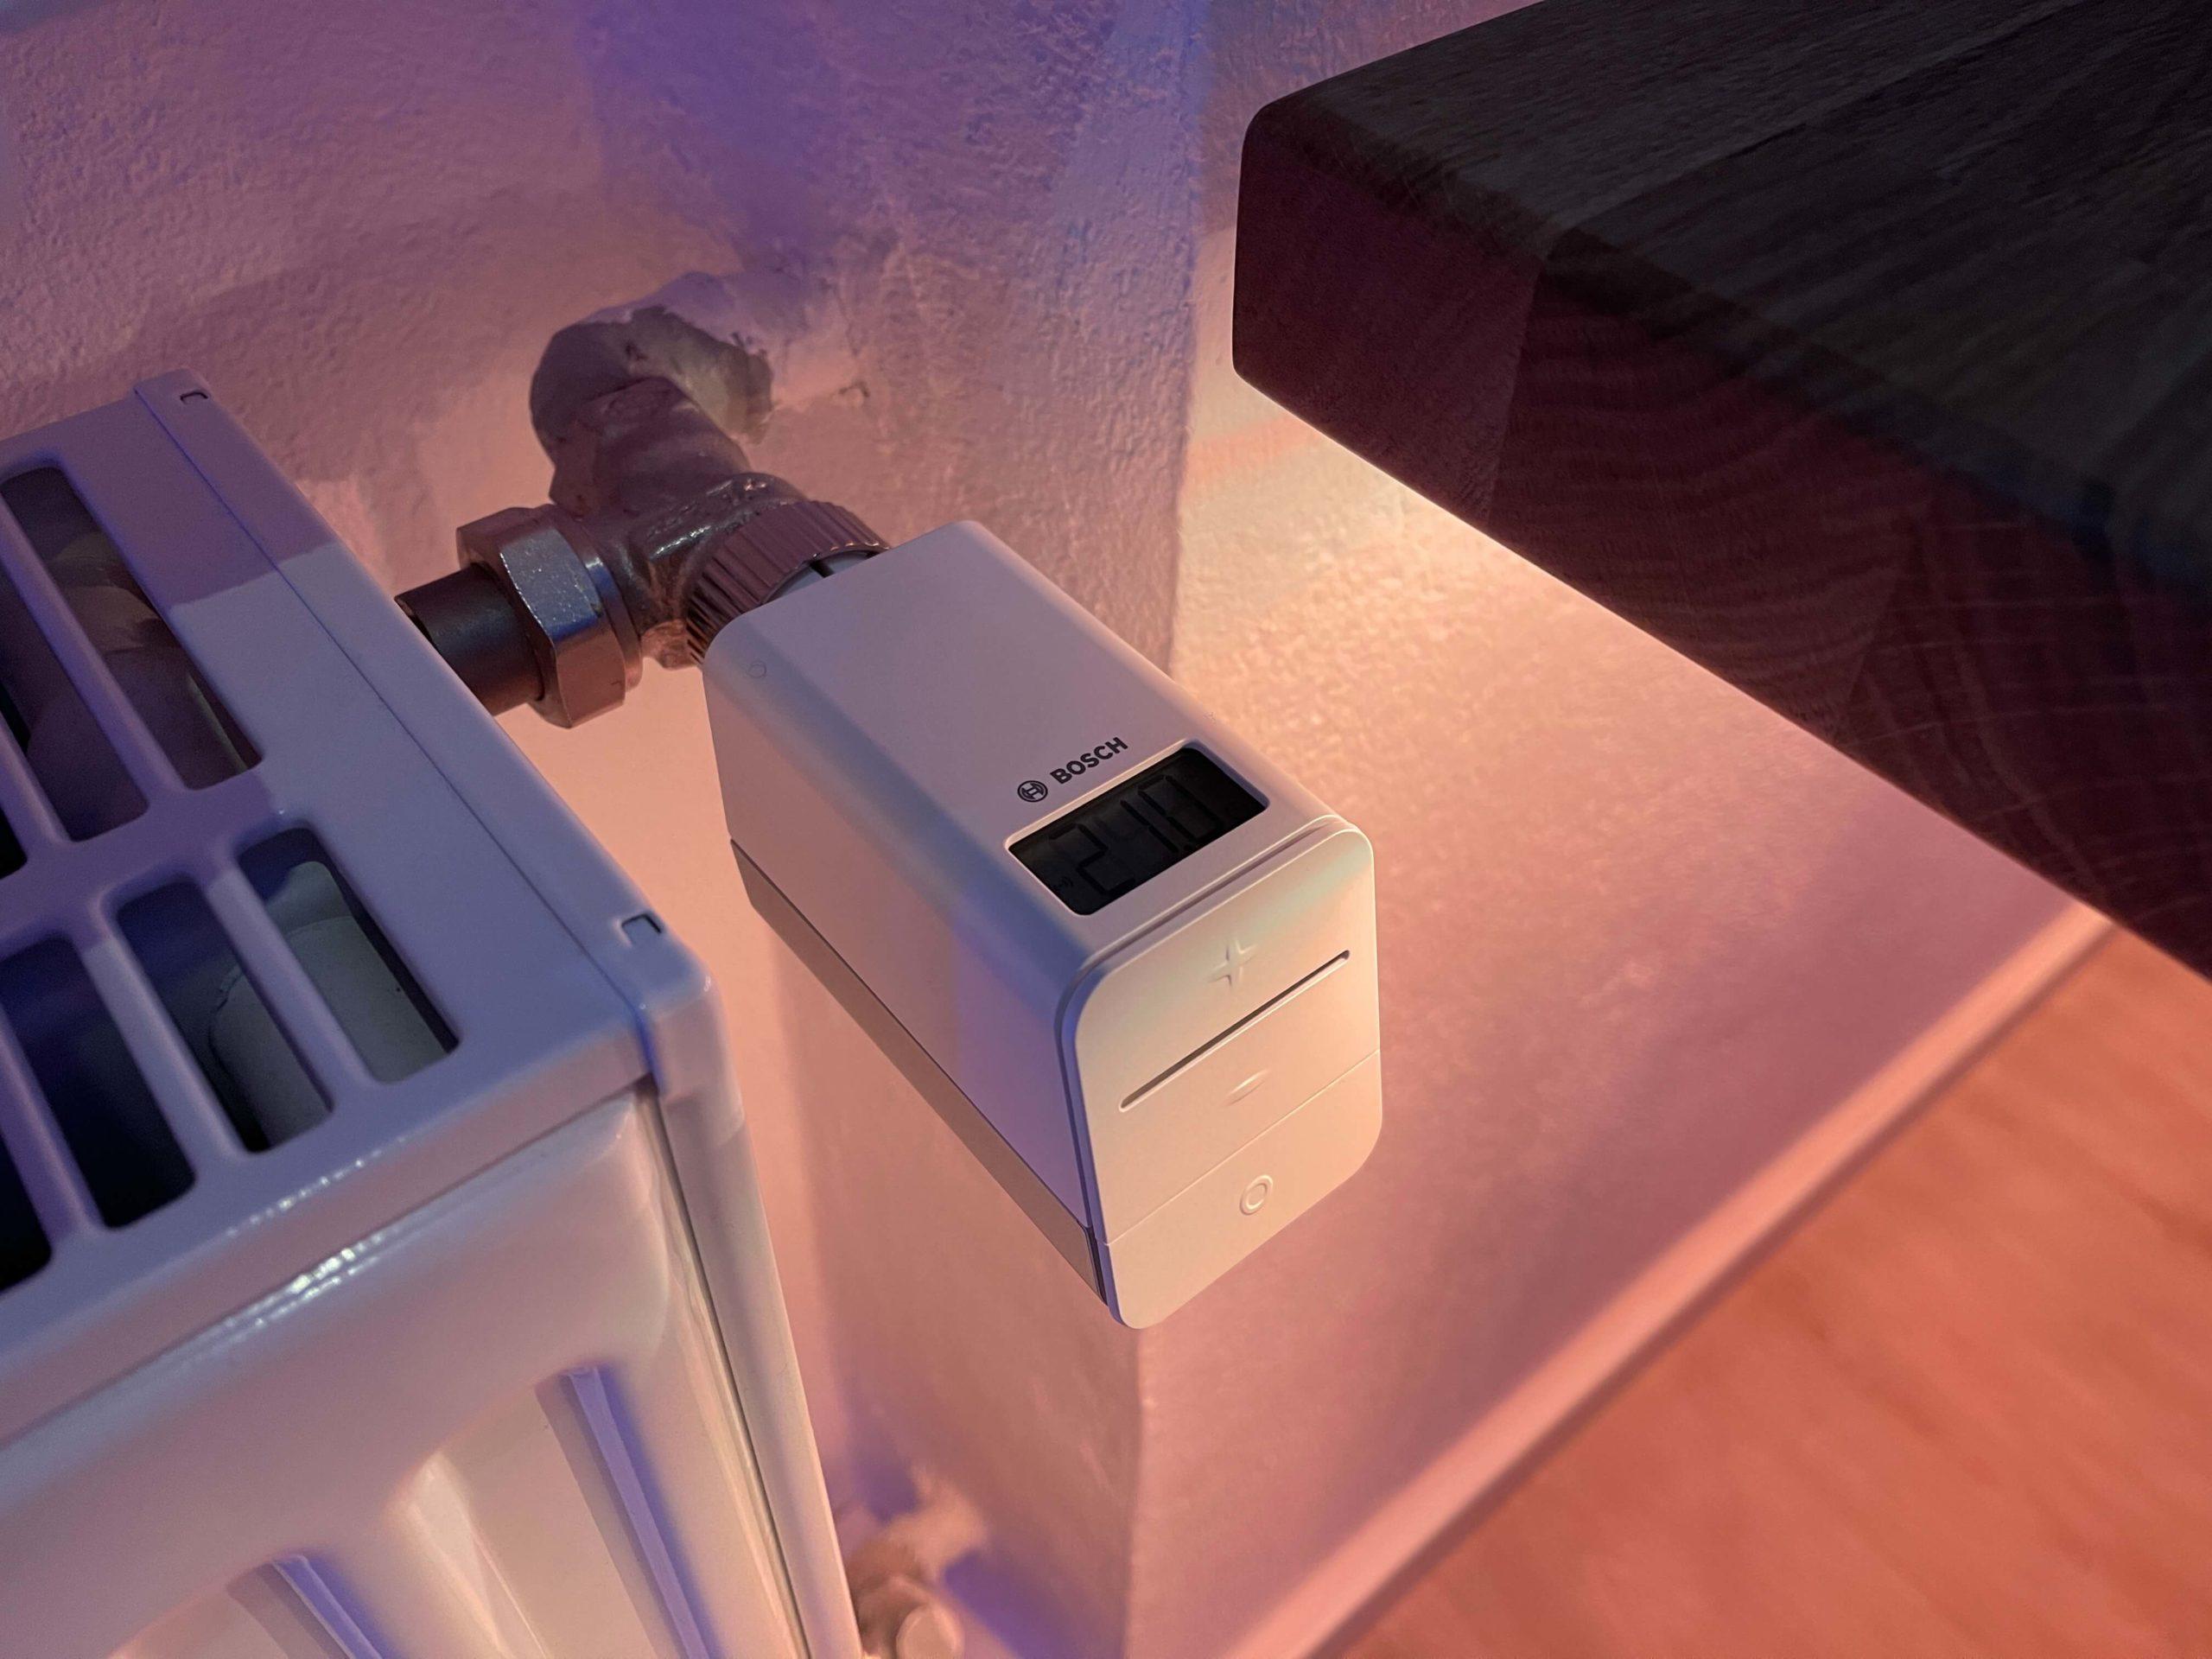 Bosch-Smart-Home-in-Perfektion-mit-Apple-HomeKit9-scaled Bosch Smart Home - in Perfektion mit Apple HomeKit